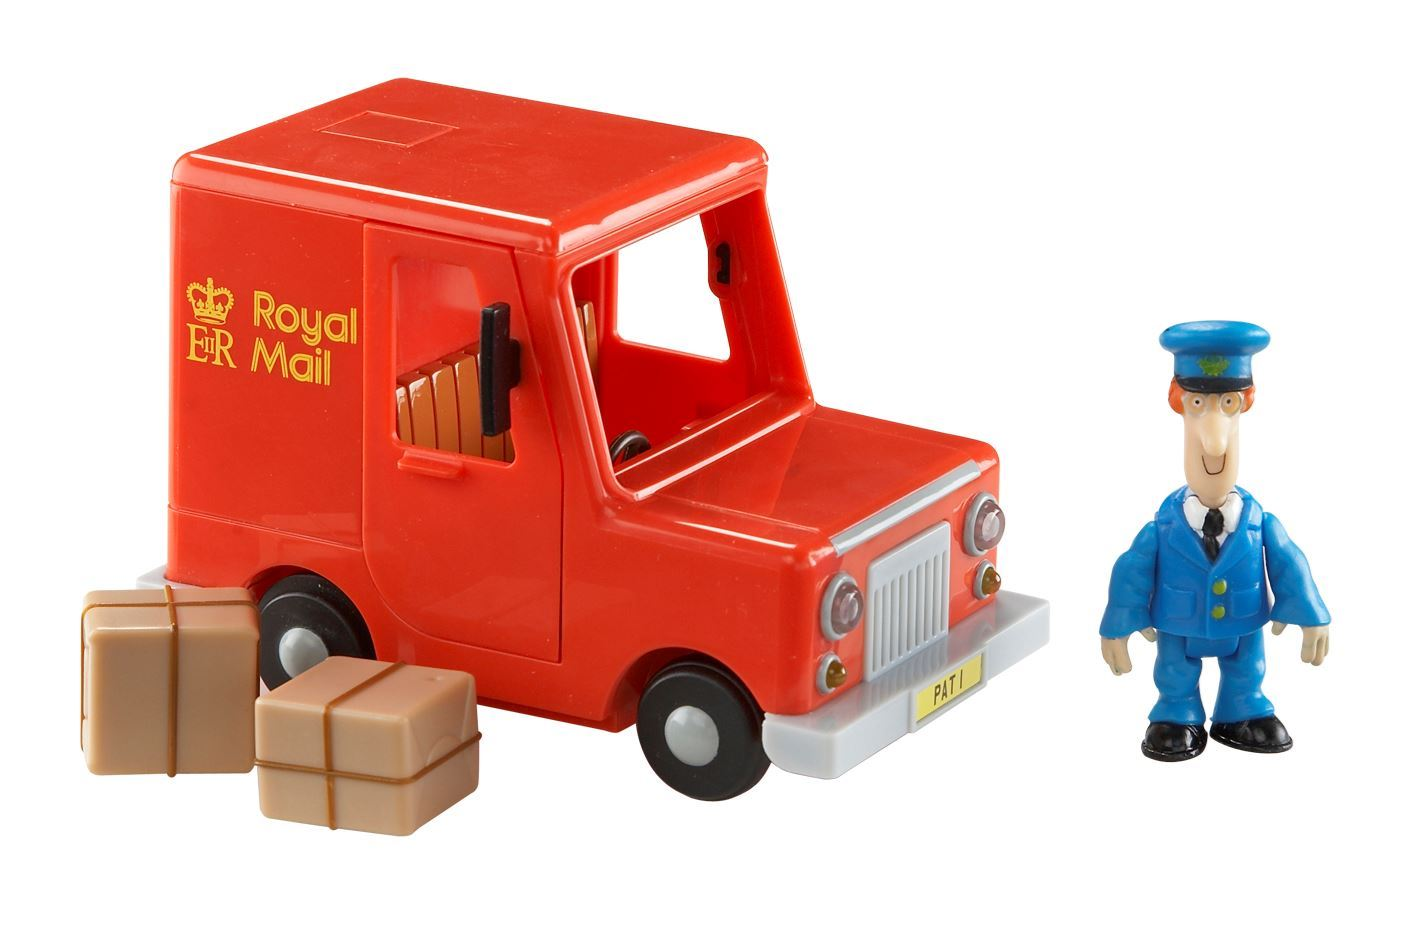 Postman Pat Classic Vehicle And Accessory Set - Pats Royal Mail Van